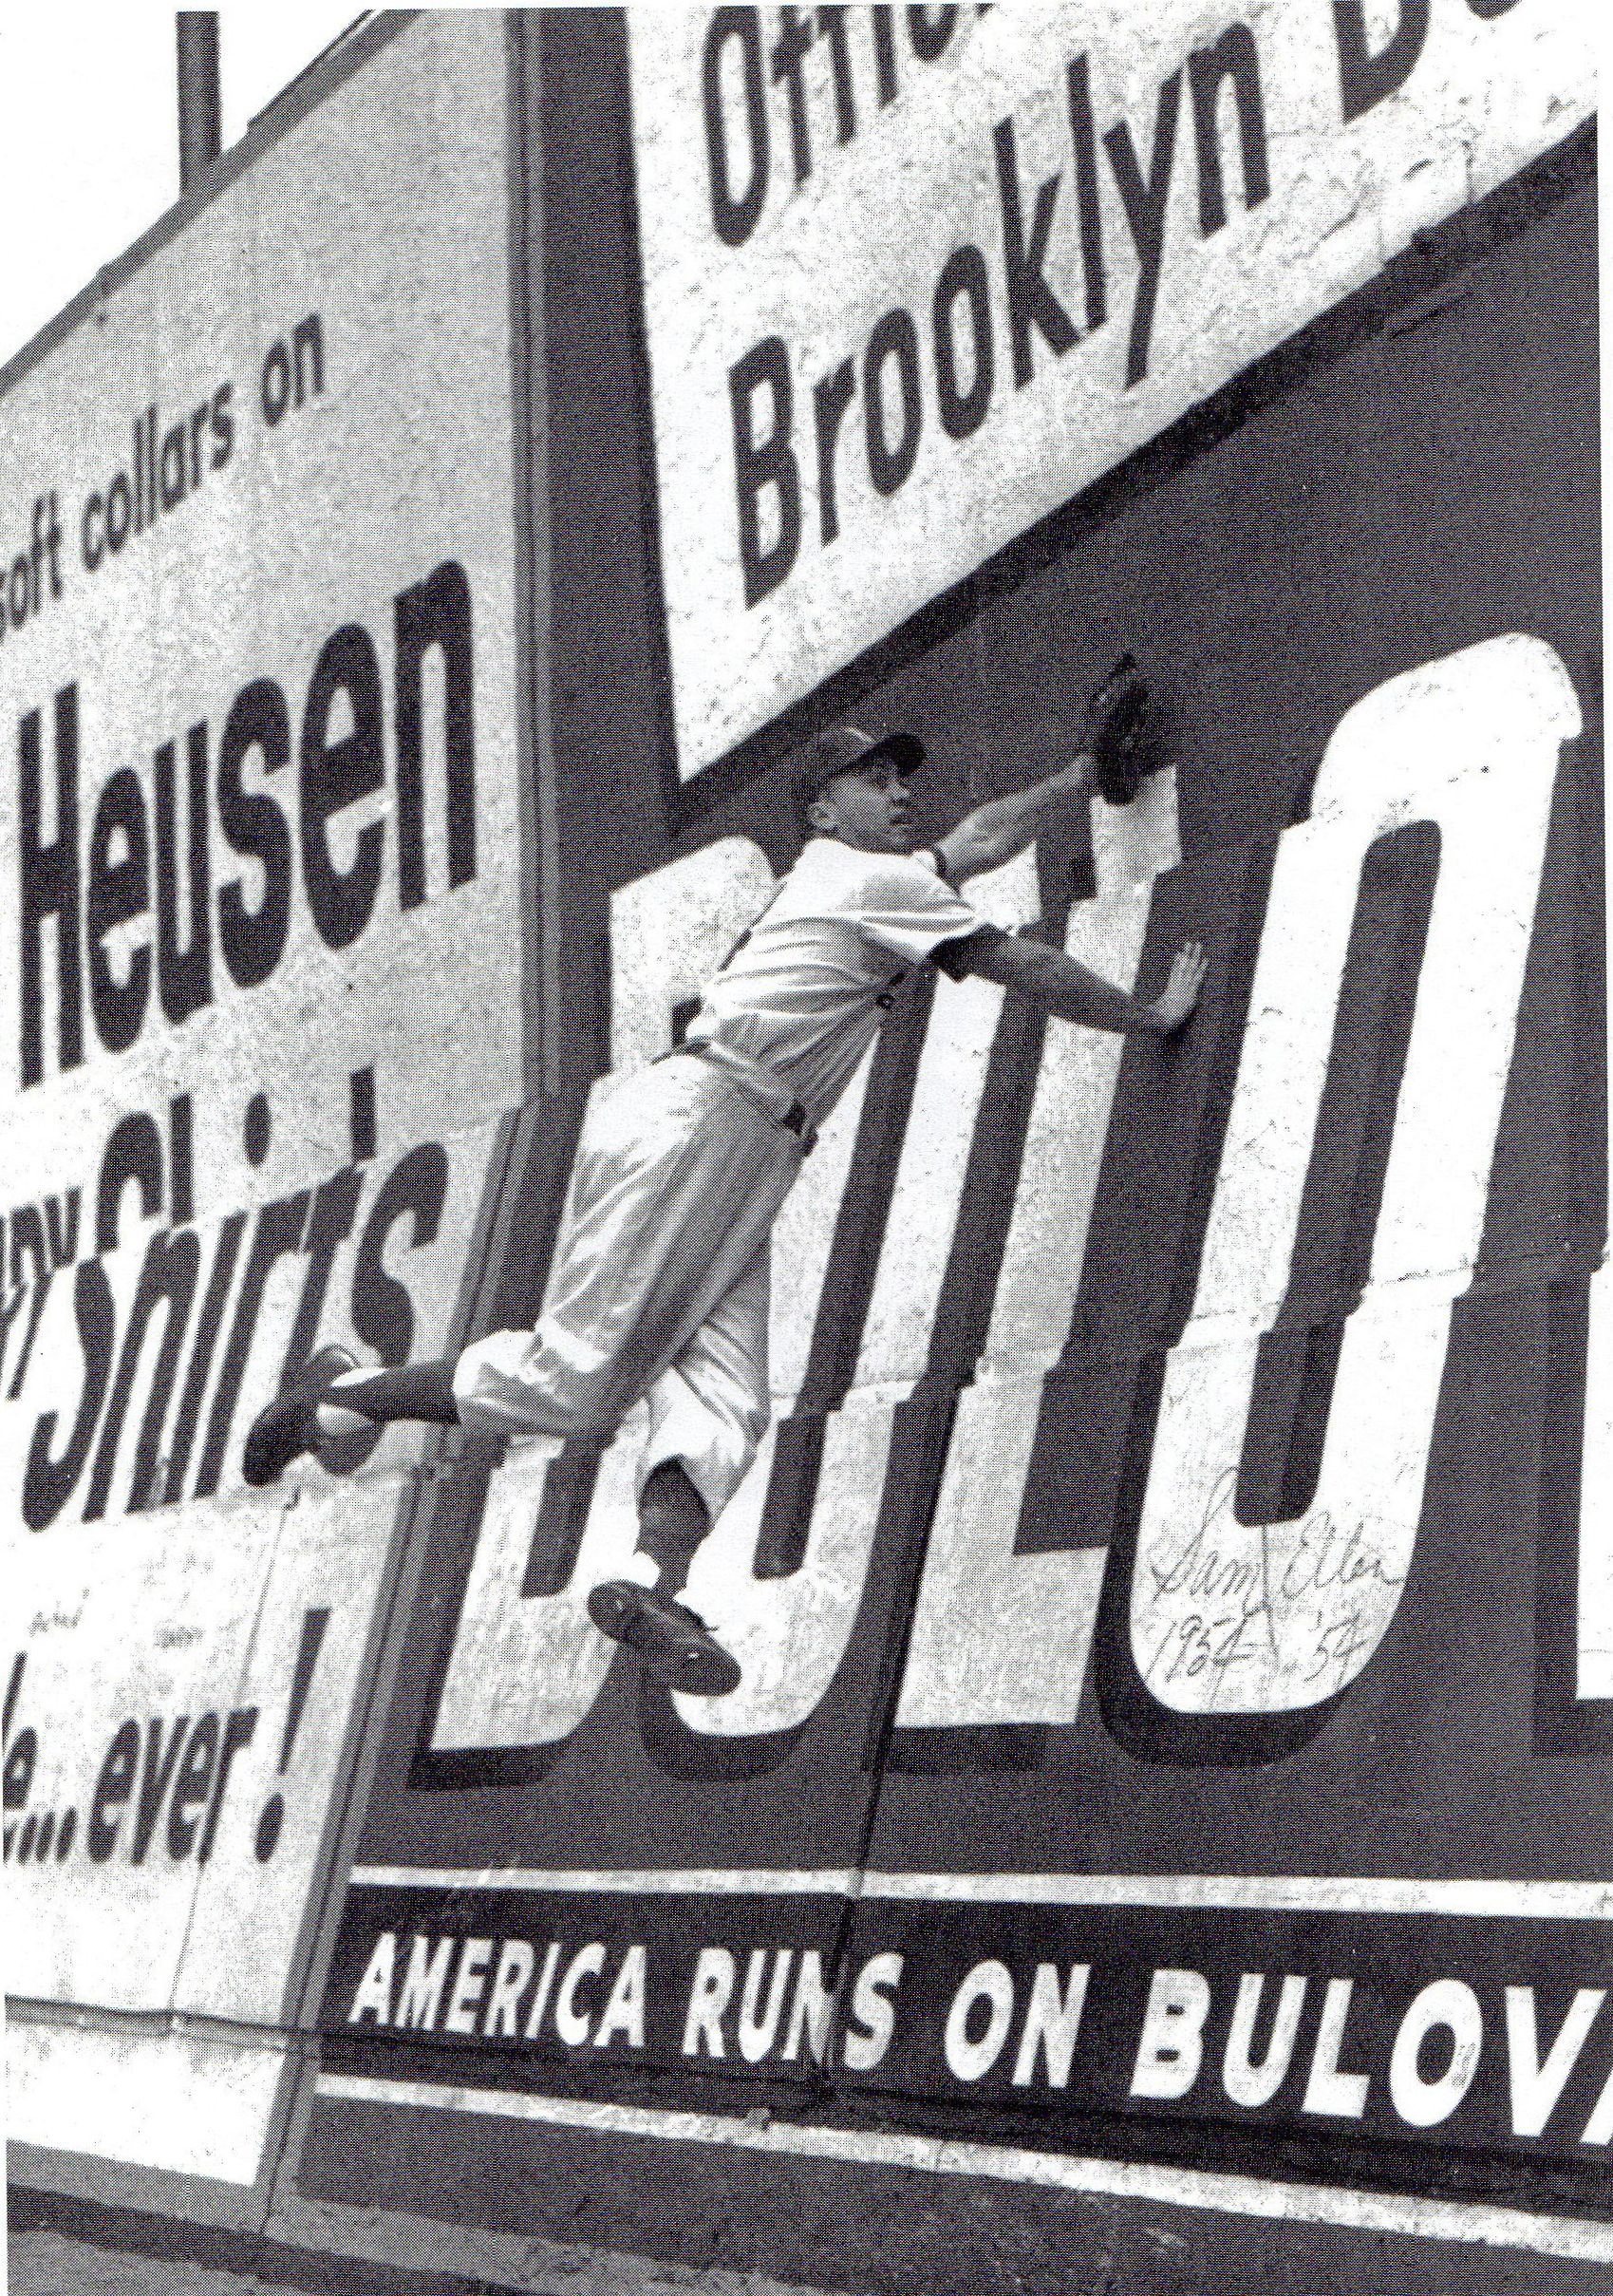 Duke Snider Doing A Practice Leap Off Ebbets Field Wall Dodgers Autograph Jsa